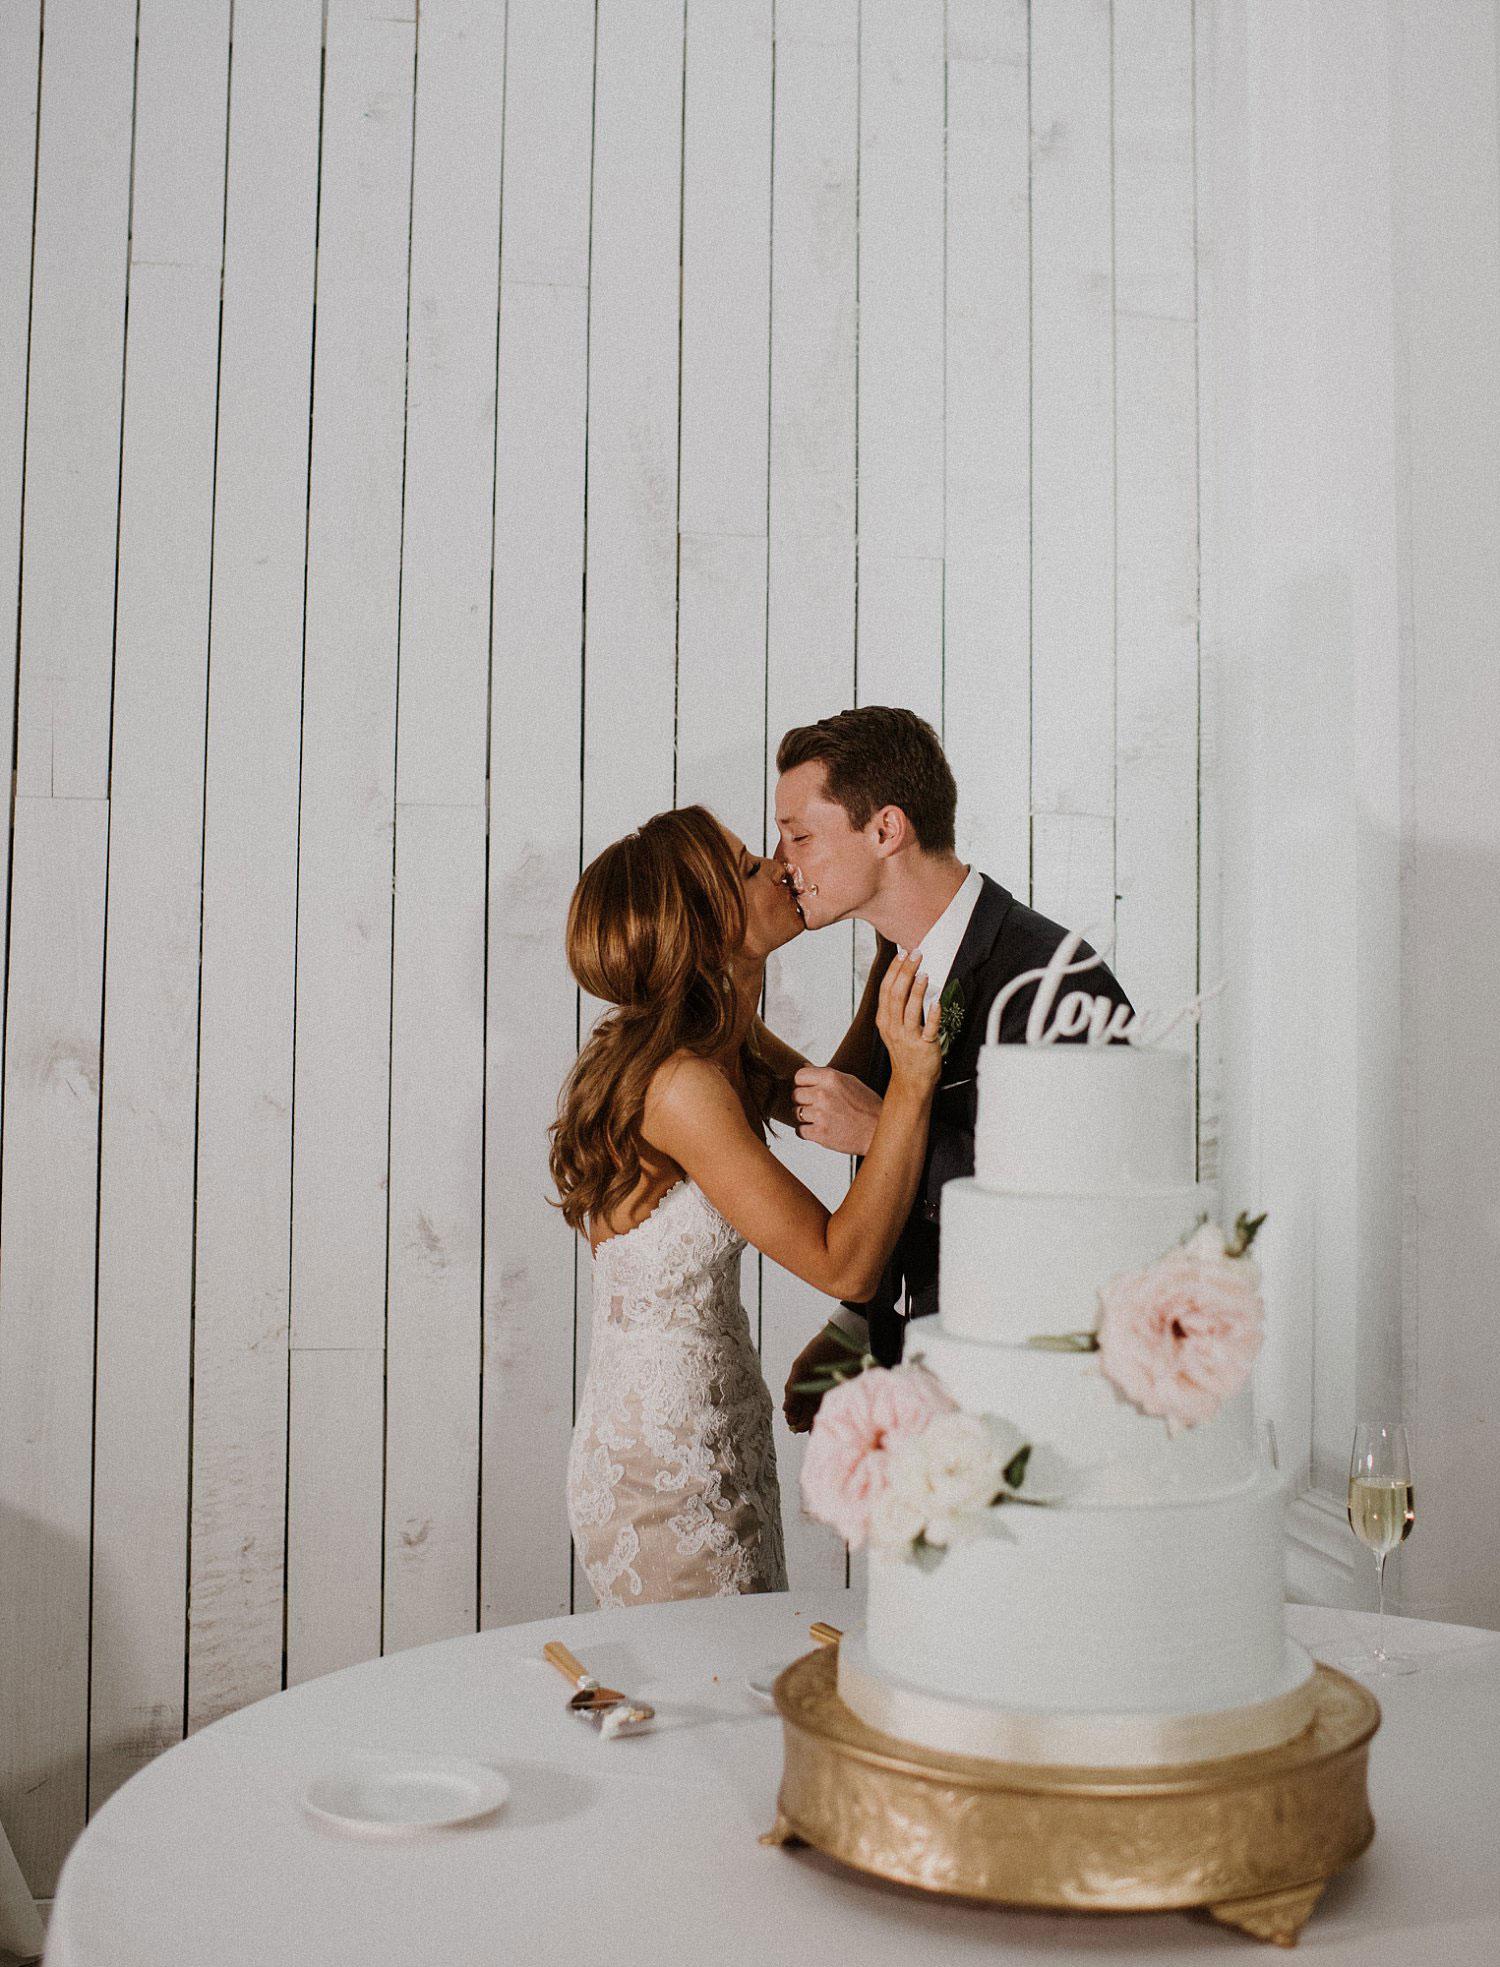 Bride and groom cutting wedding cake at white sparrow barn wedding